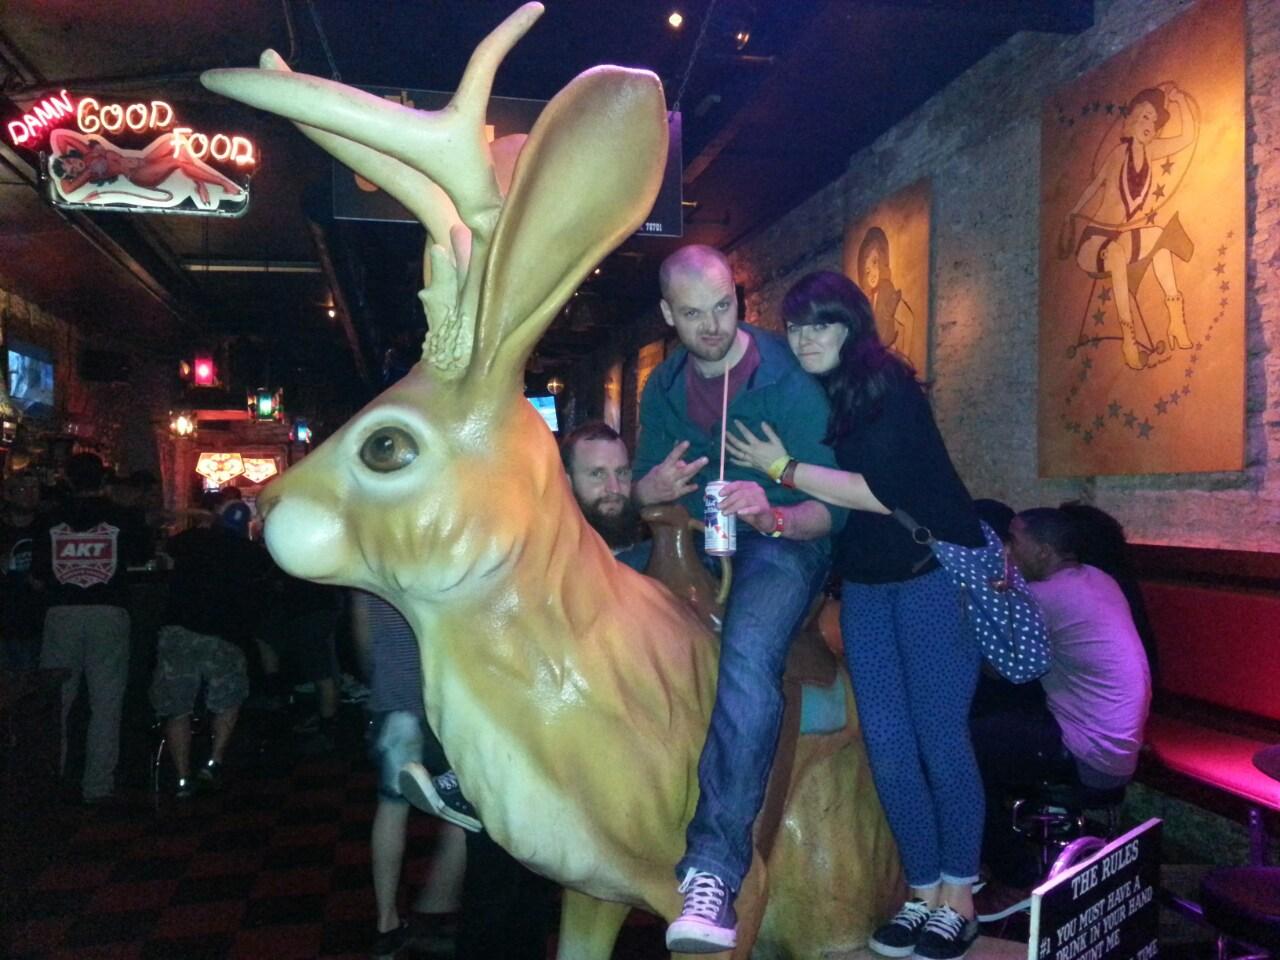 Dott being sober in thr Jackalope at SXSW